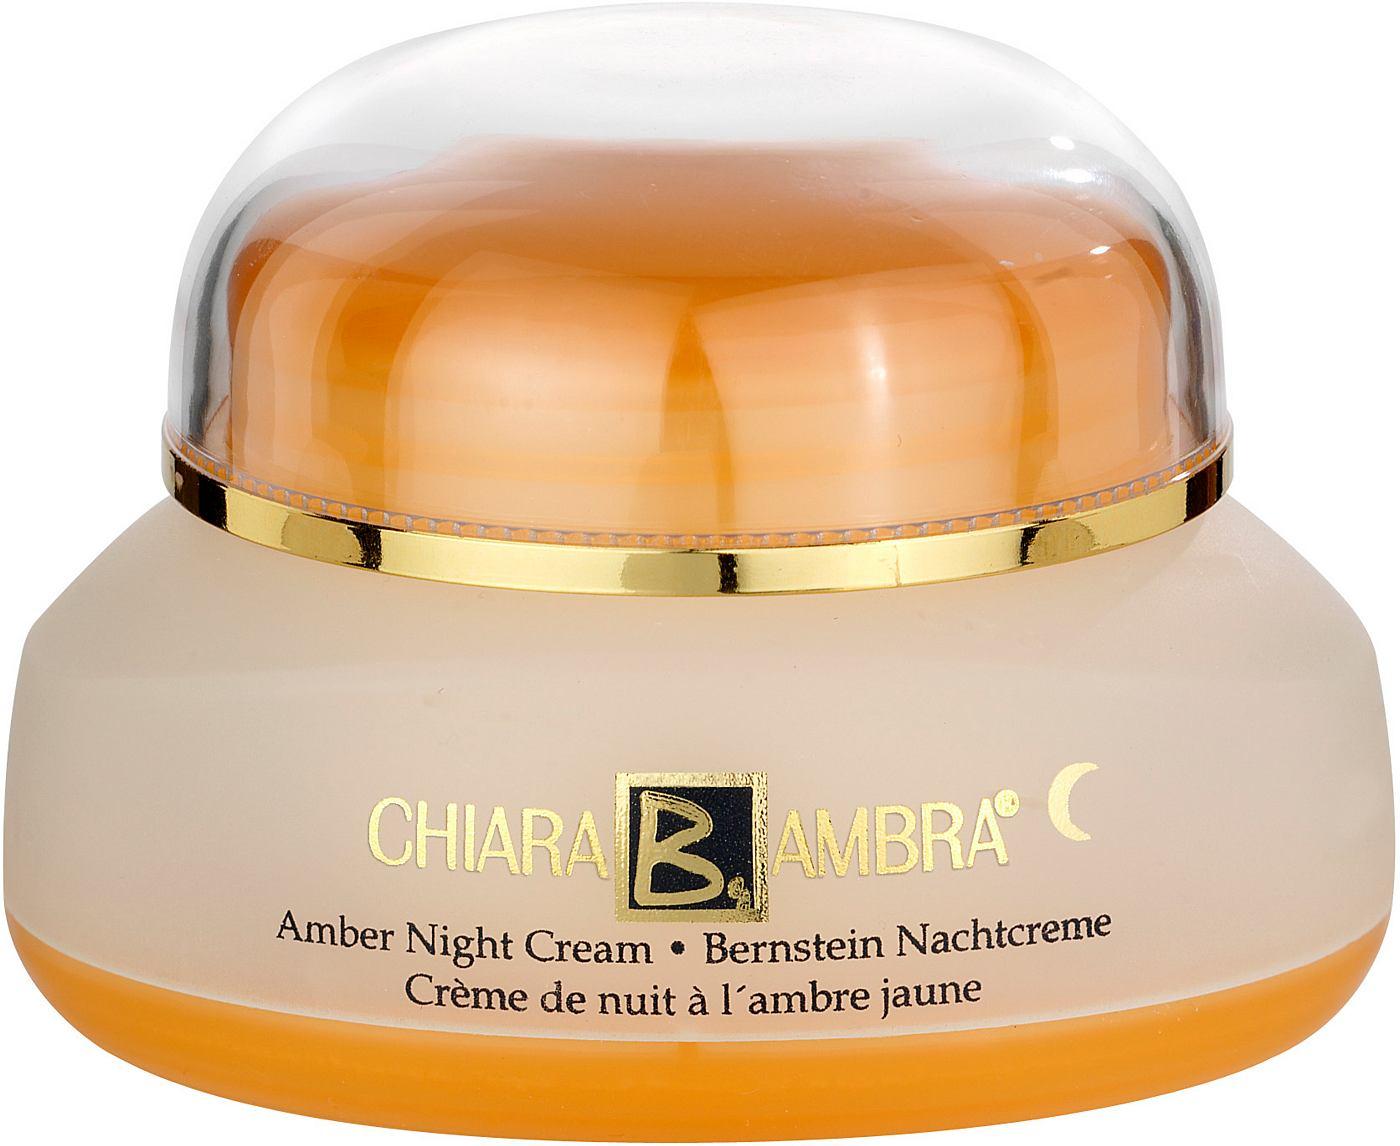 CHIARA AMBRA Bernstein nachtcrème anti-aging